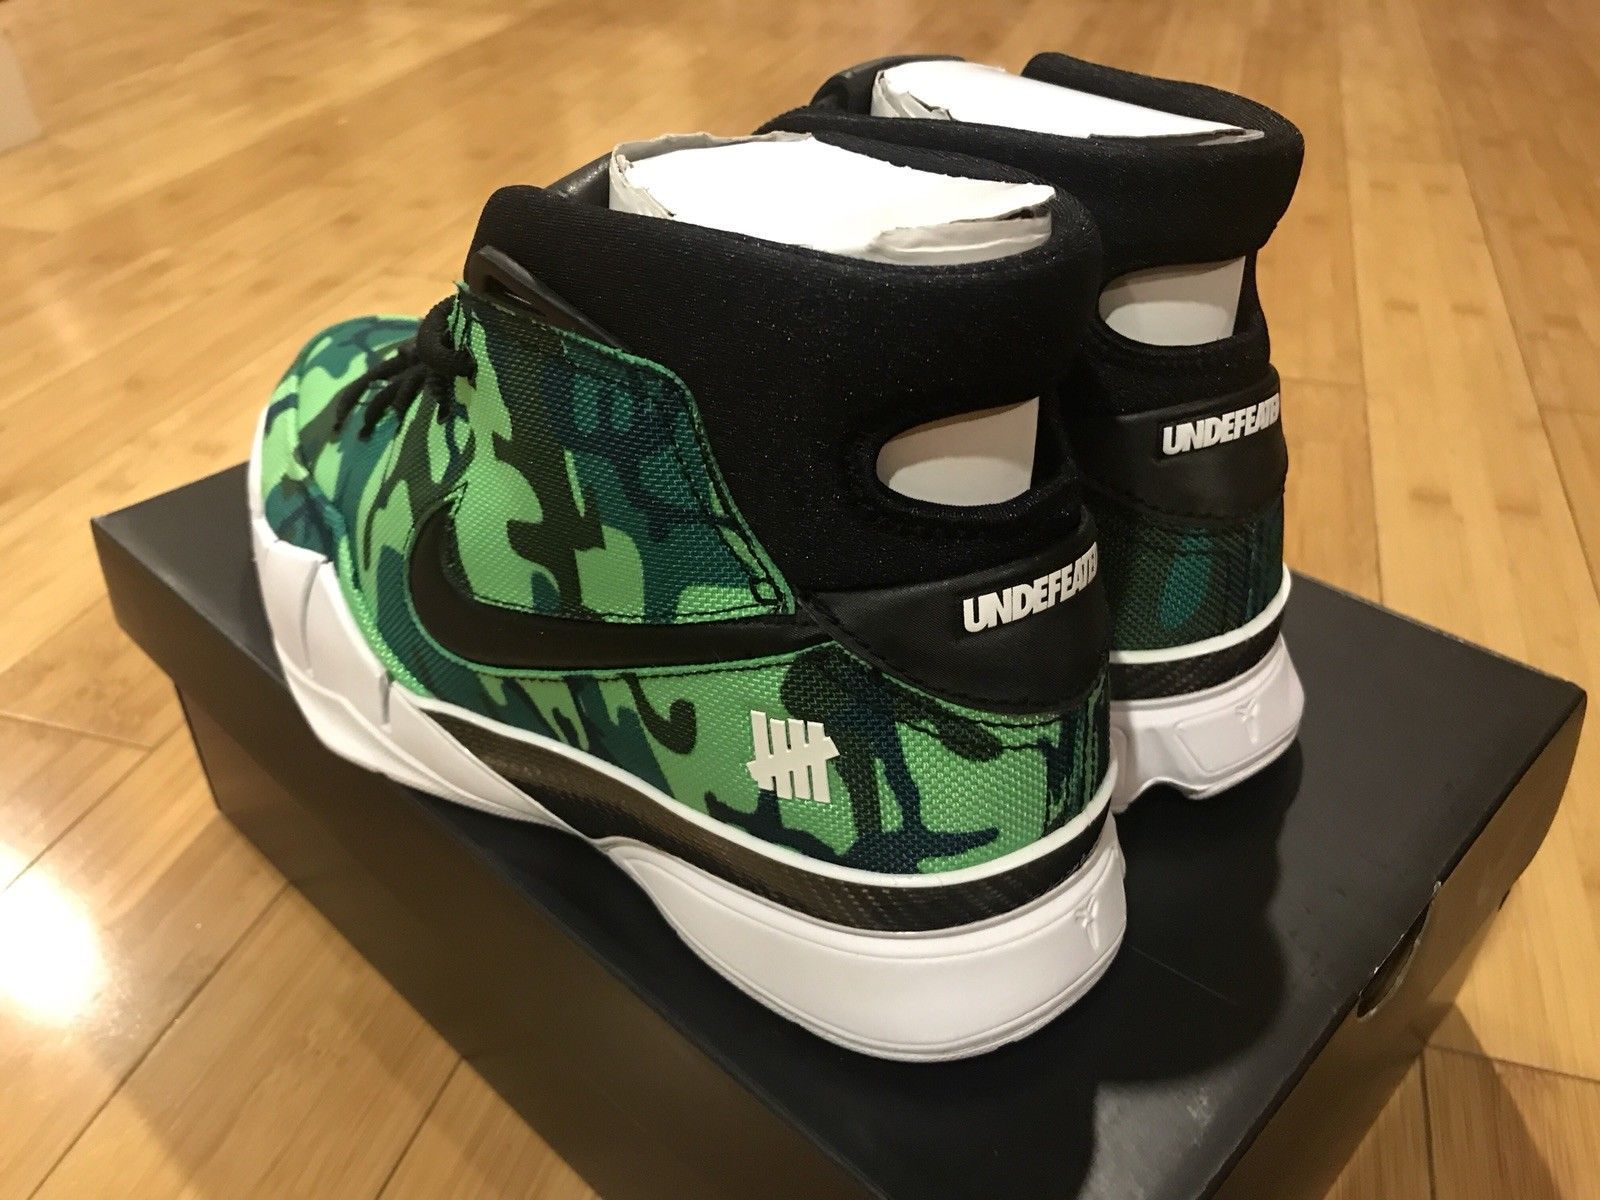 san francisco c6599 2444b Nike Kobe 1 Protro PE Undefeated Exclusive Sz 10.5 Green Camo Giannis  Silverlake